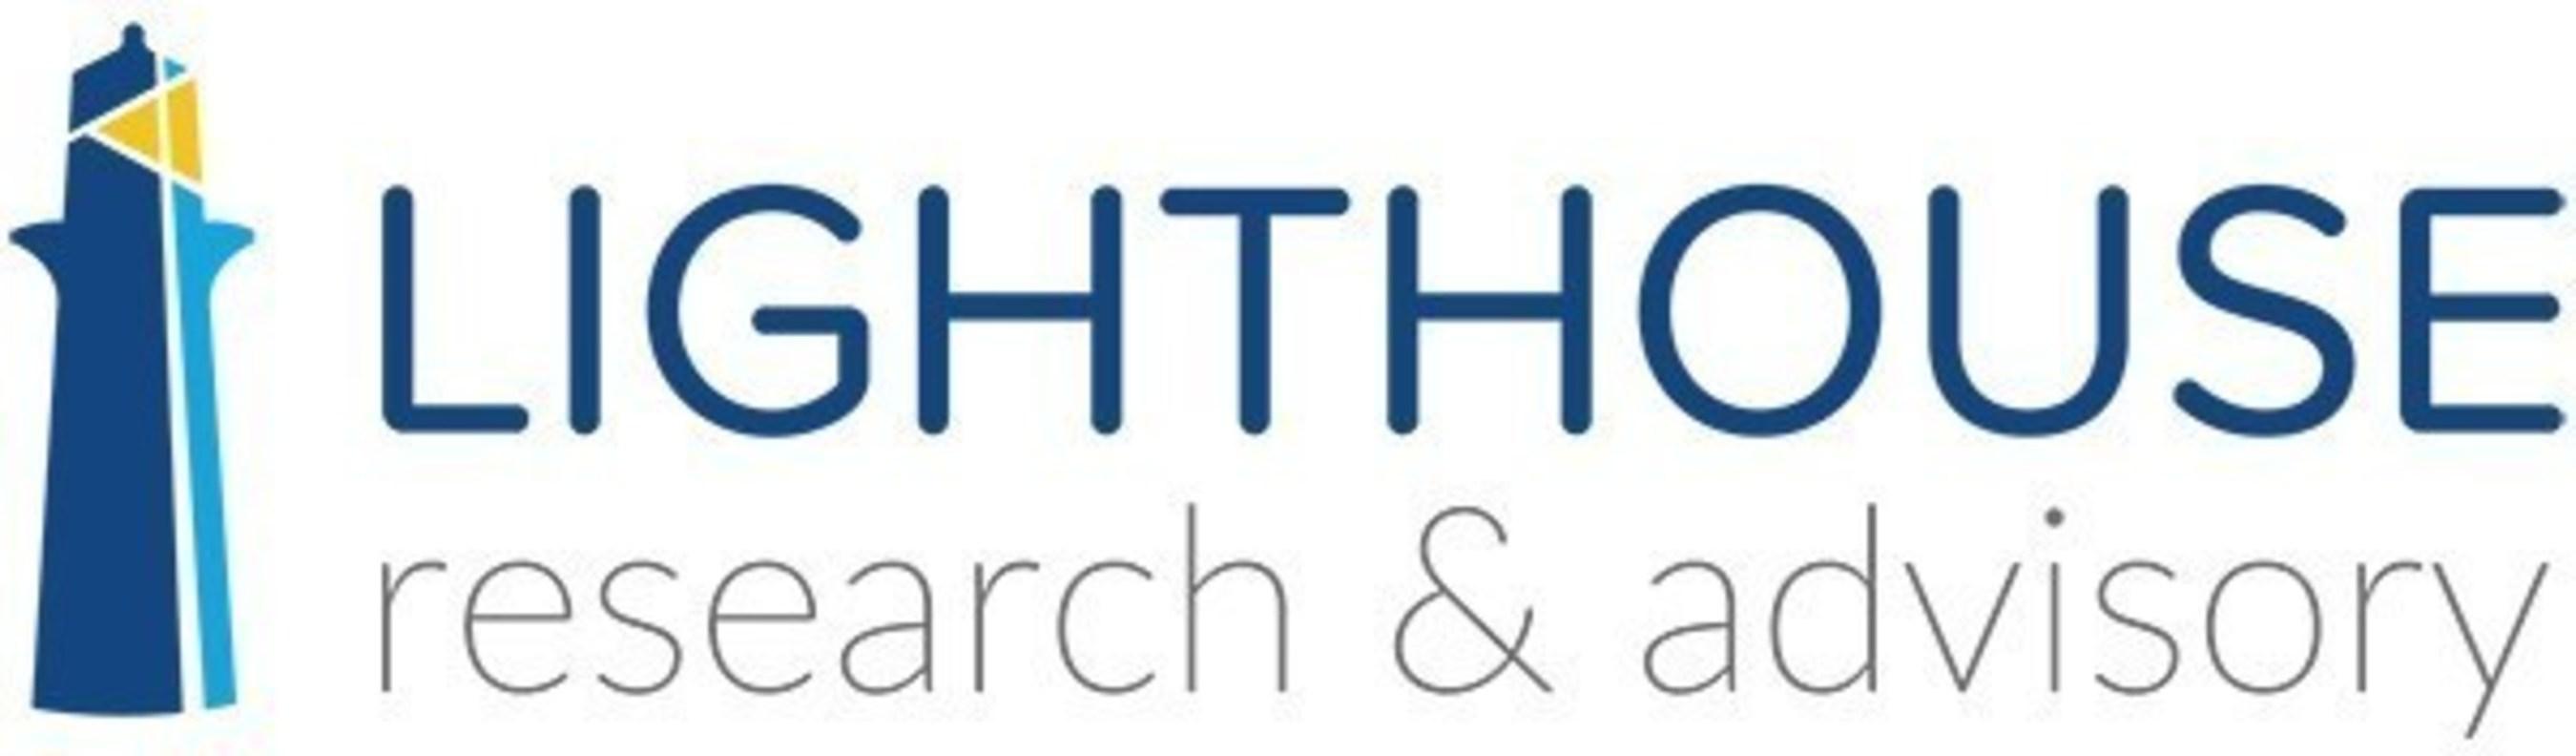 Lighthouse Research & Advisory Logo